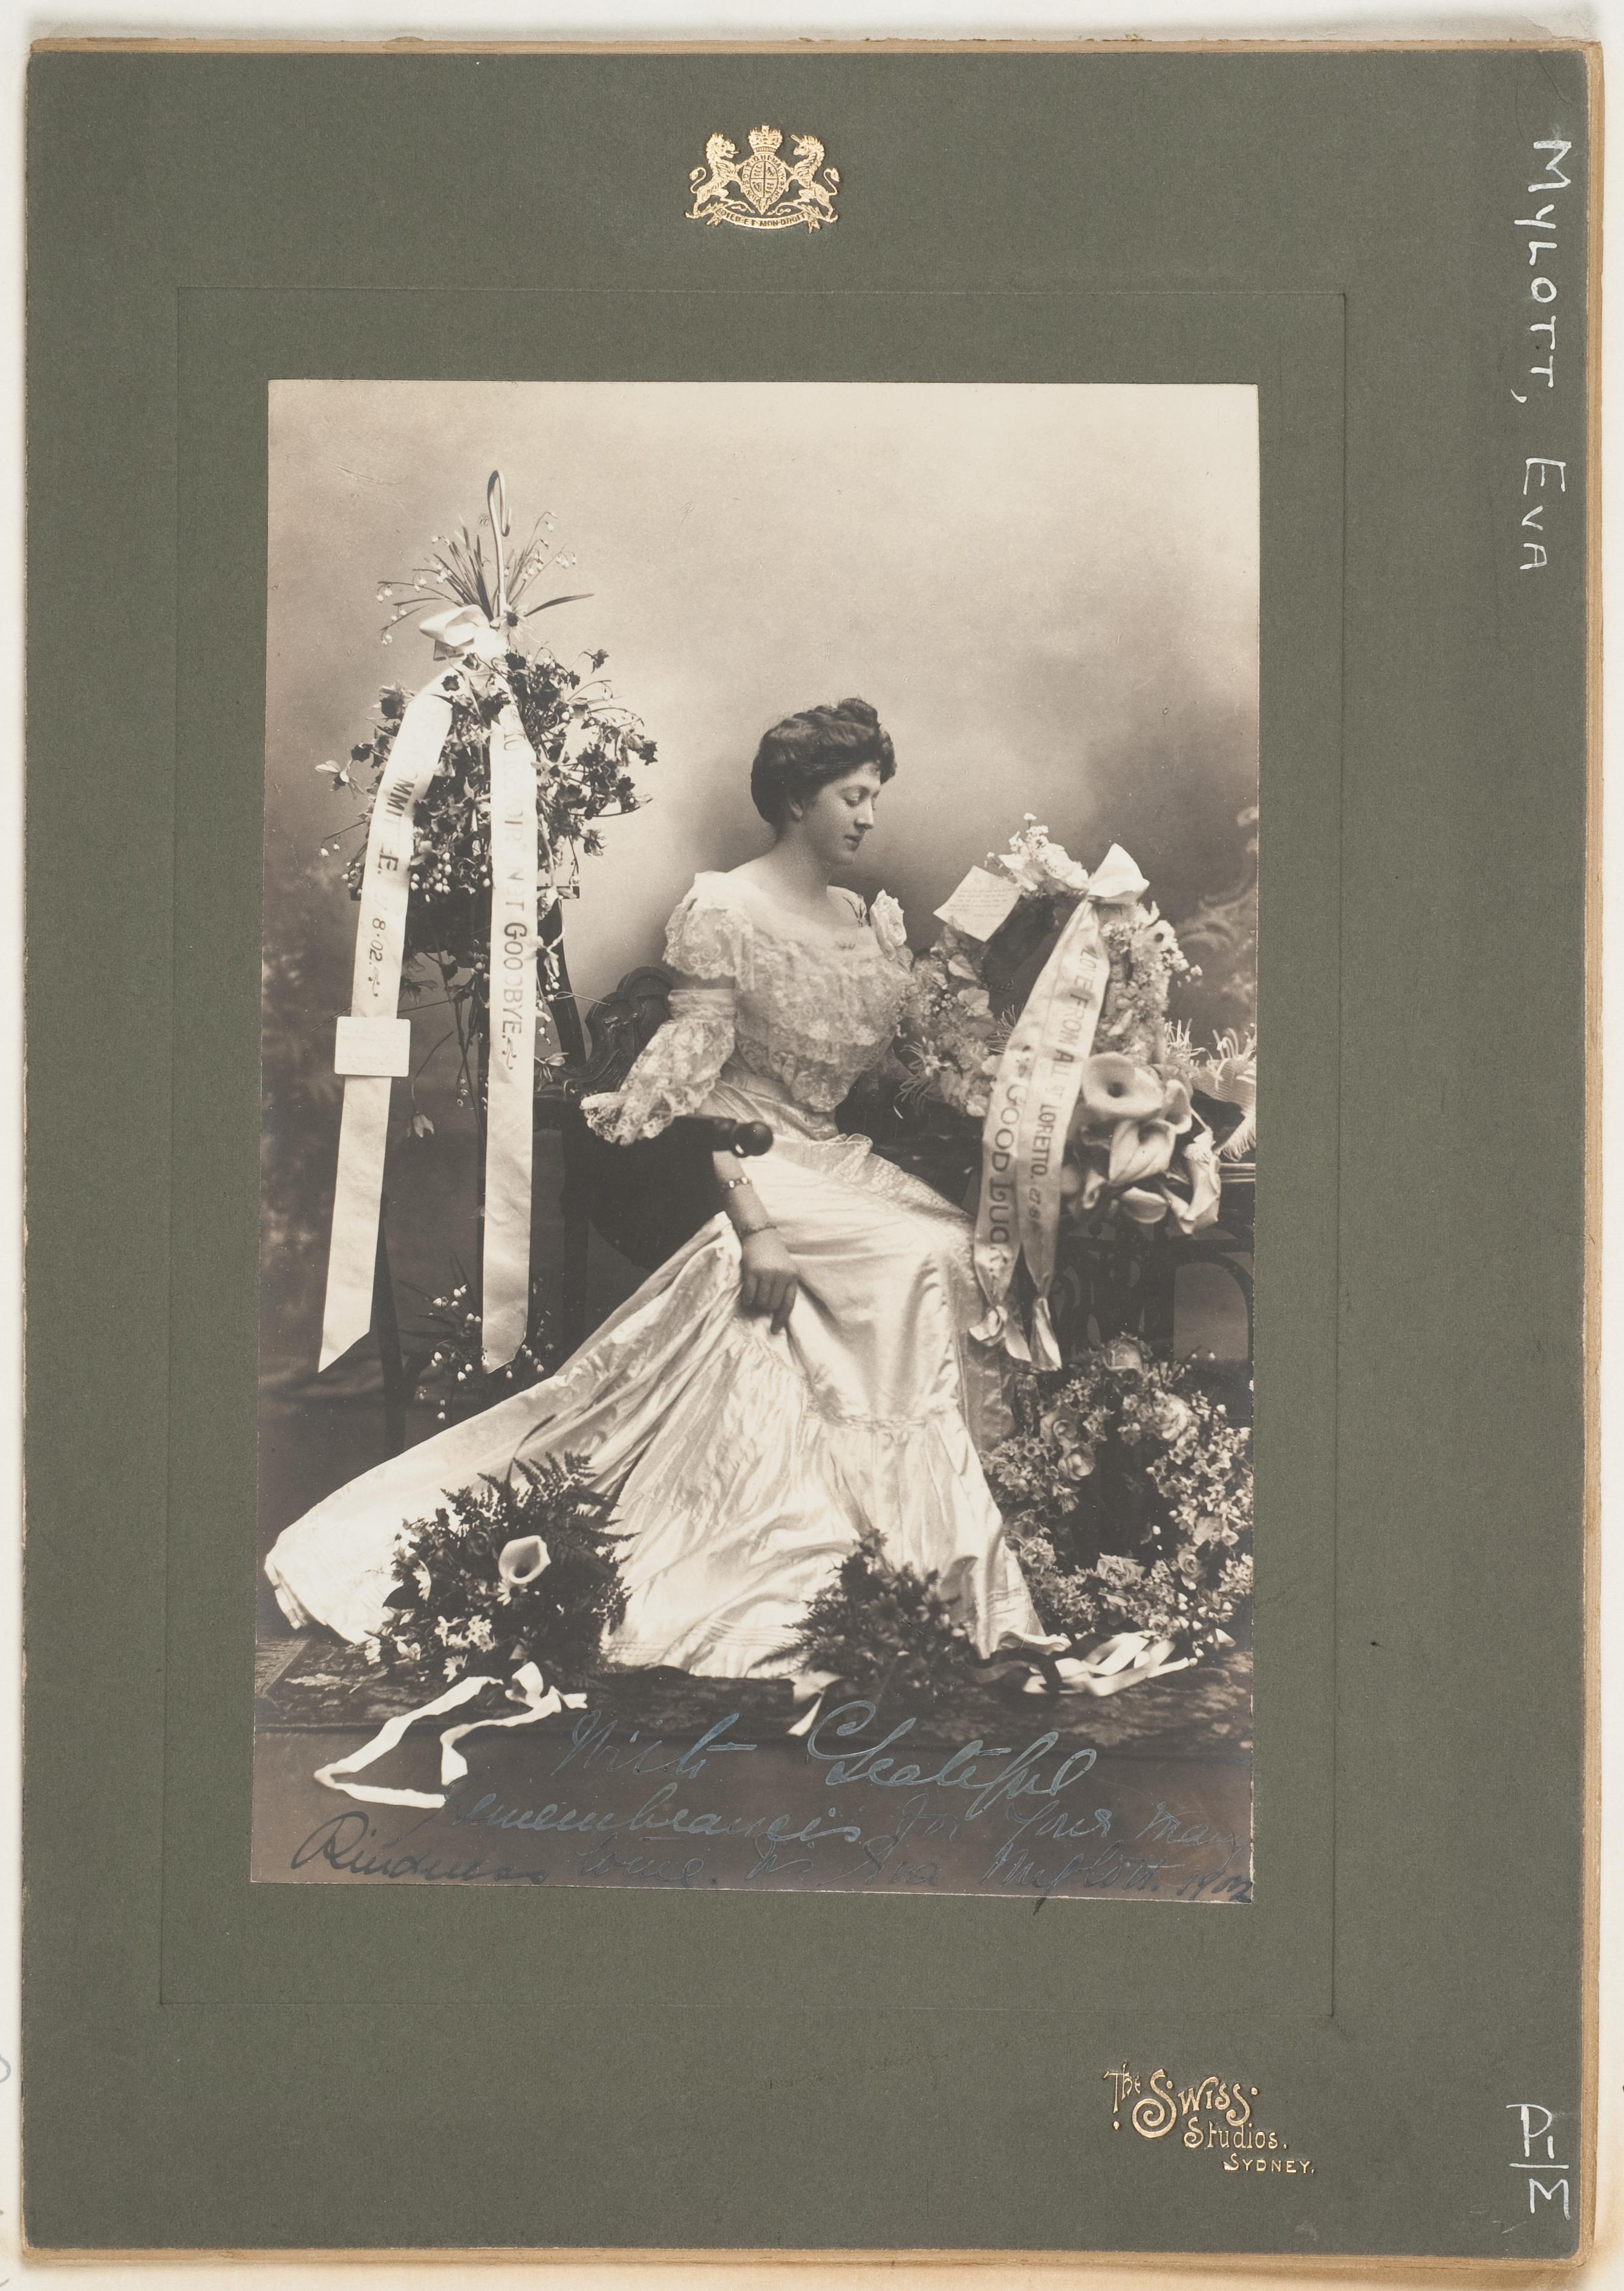 Eva Mylott, opera singer and paternal grandmother of Mel Gibson / The Swiss Studios, Sydney, 1902